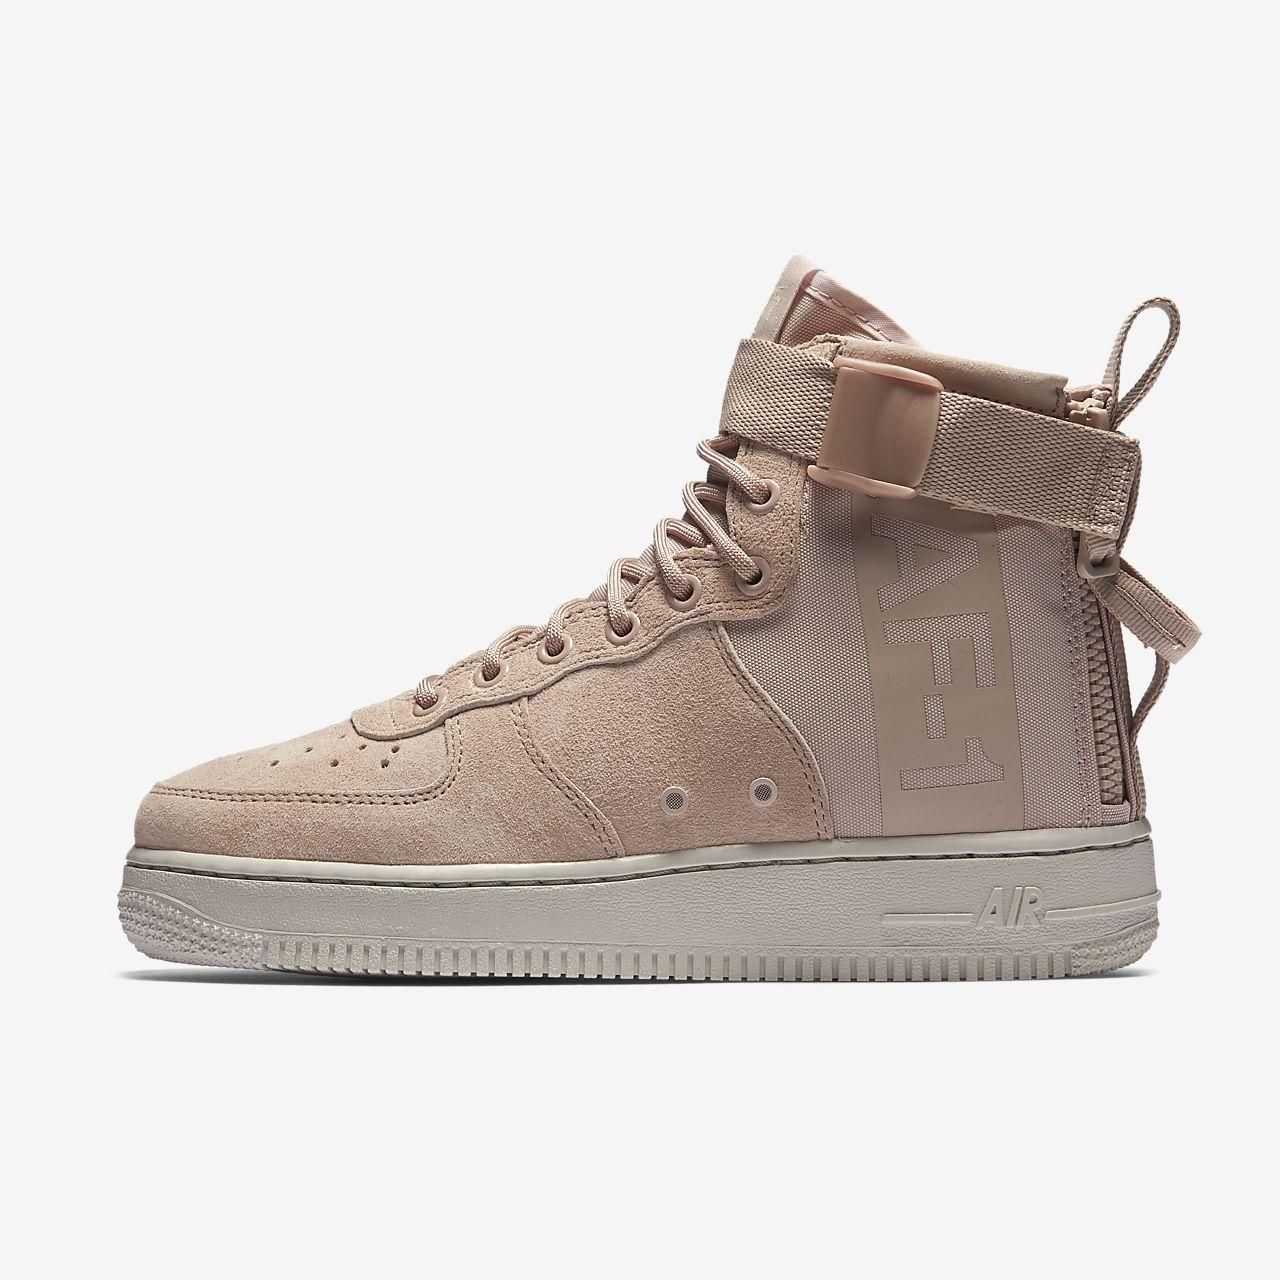 online retailer 2f013 43157 Nike SF Air Force 1 Mid - Damen Schuhe Black Größe 39